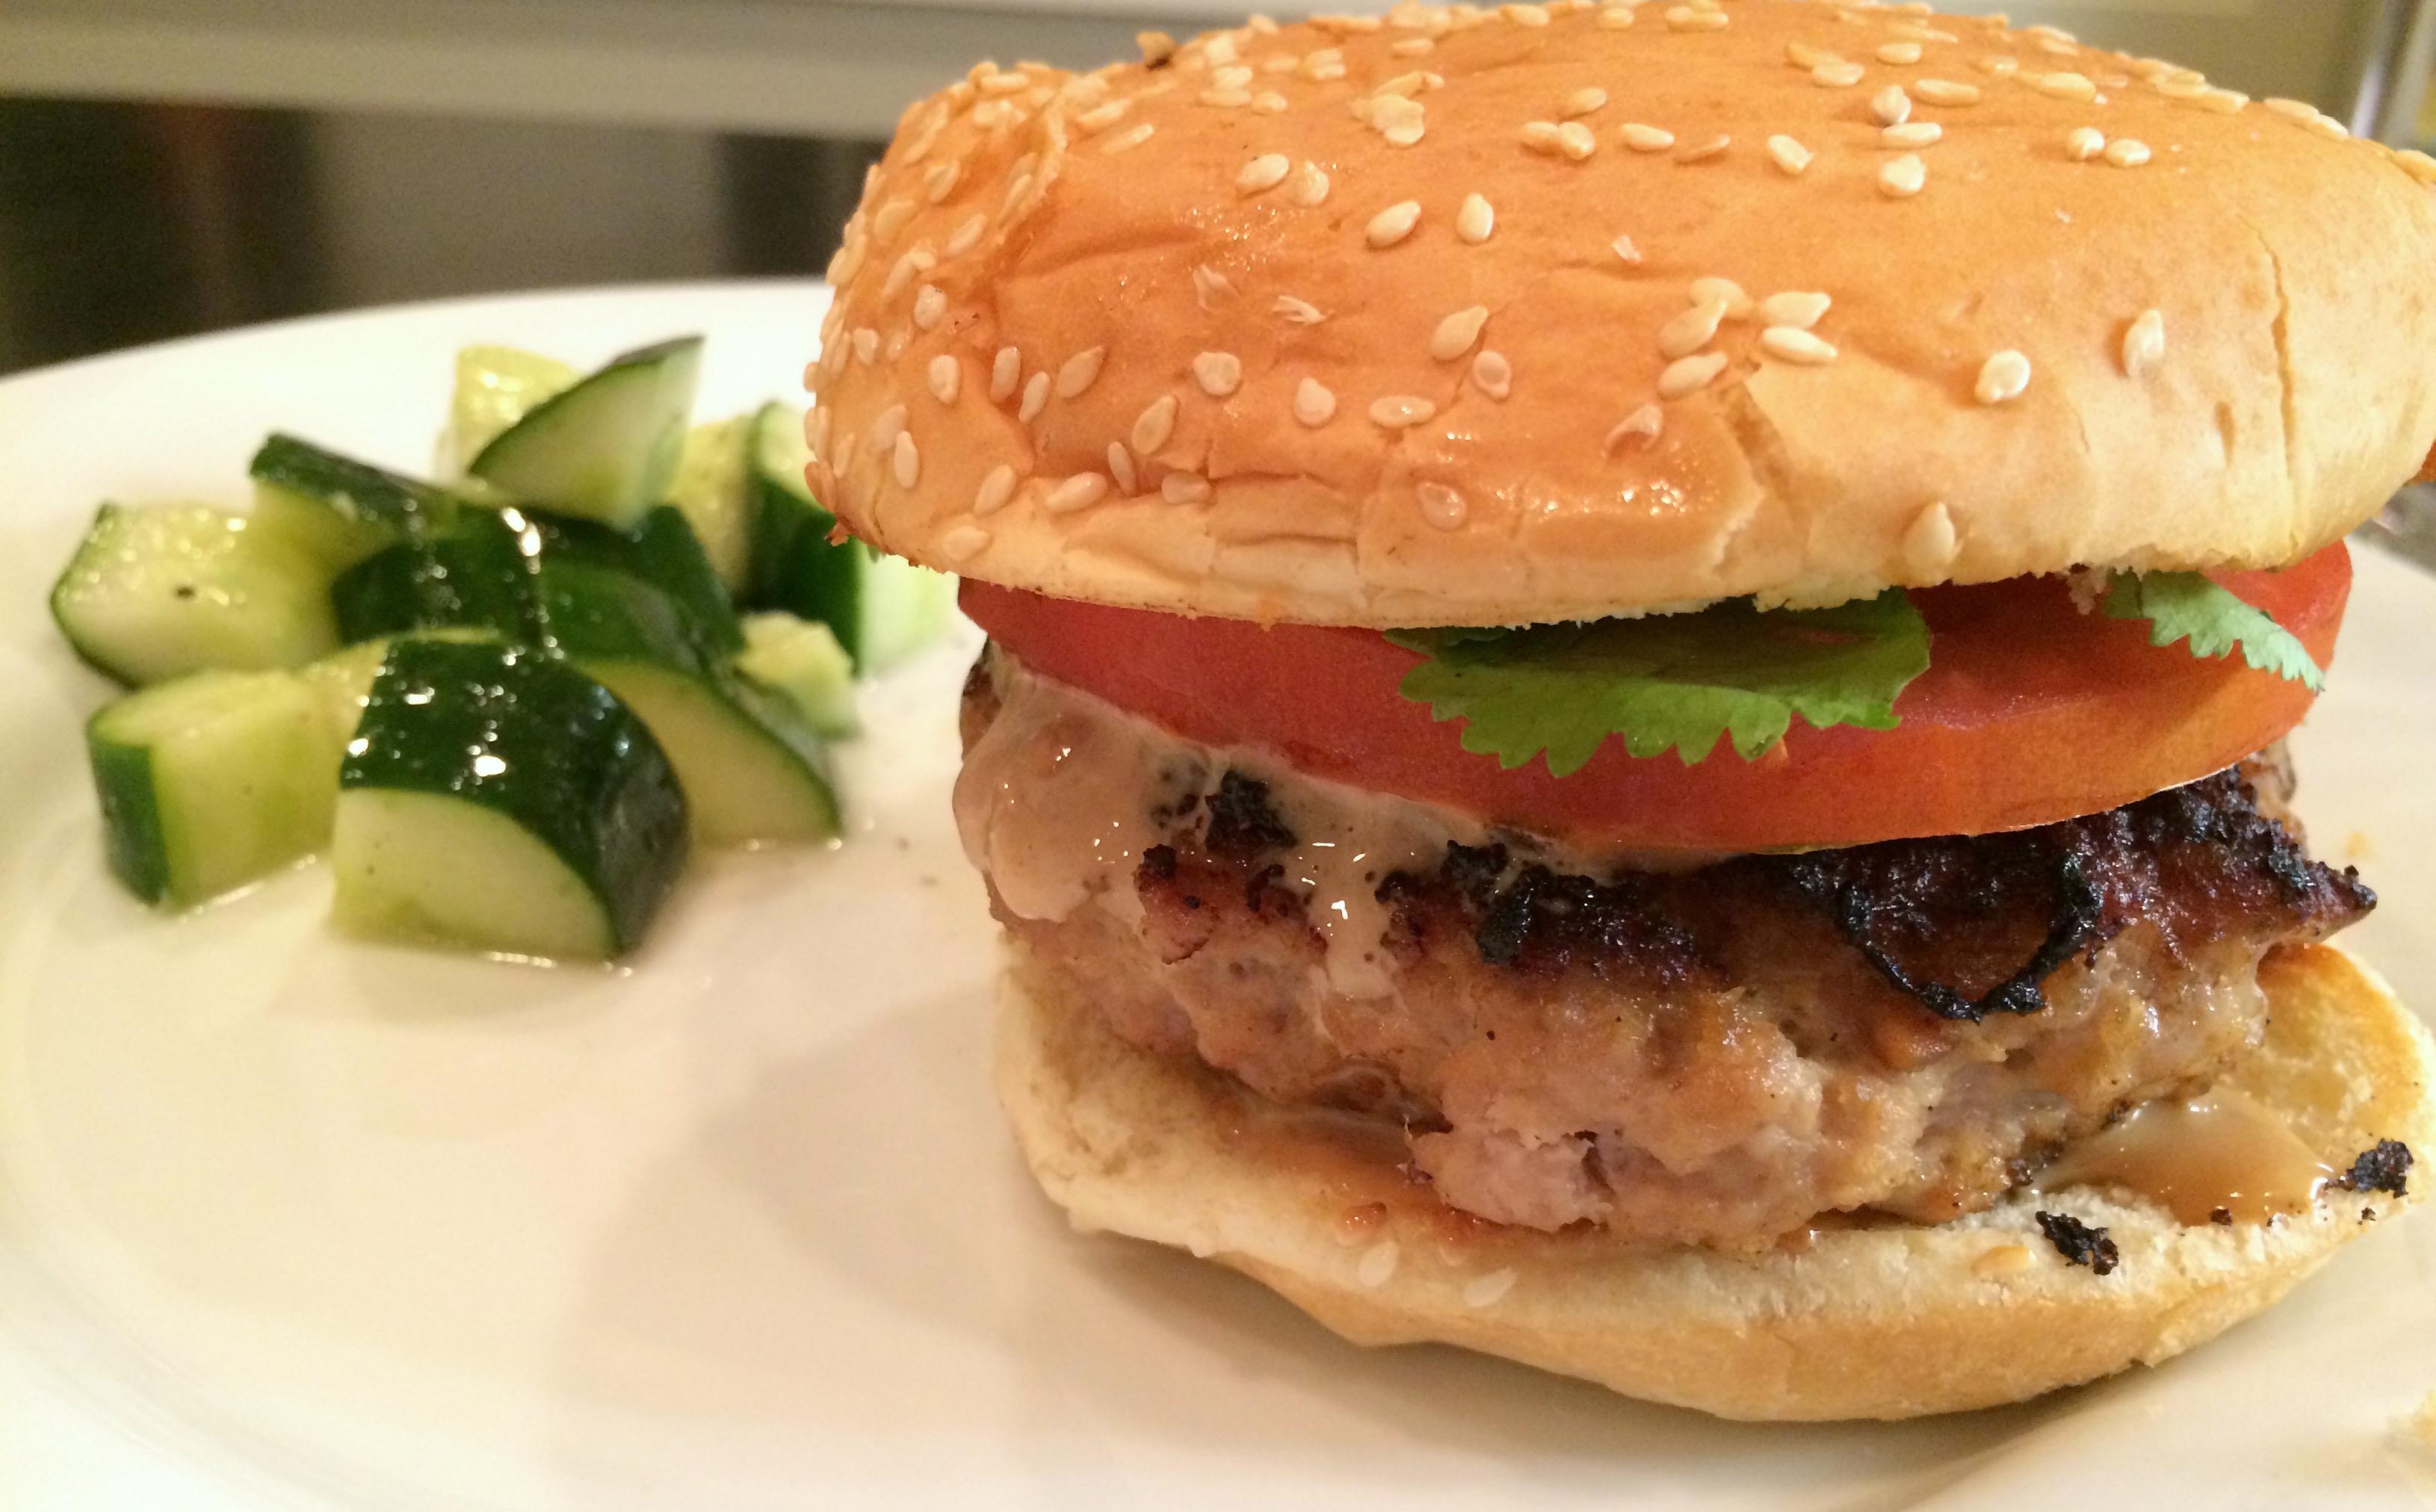 Blue apron pork burgers - Blue Apron Pork Burgers 48